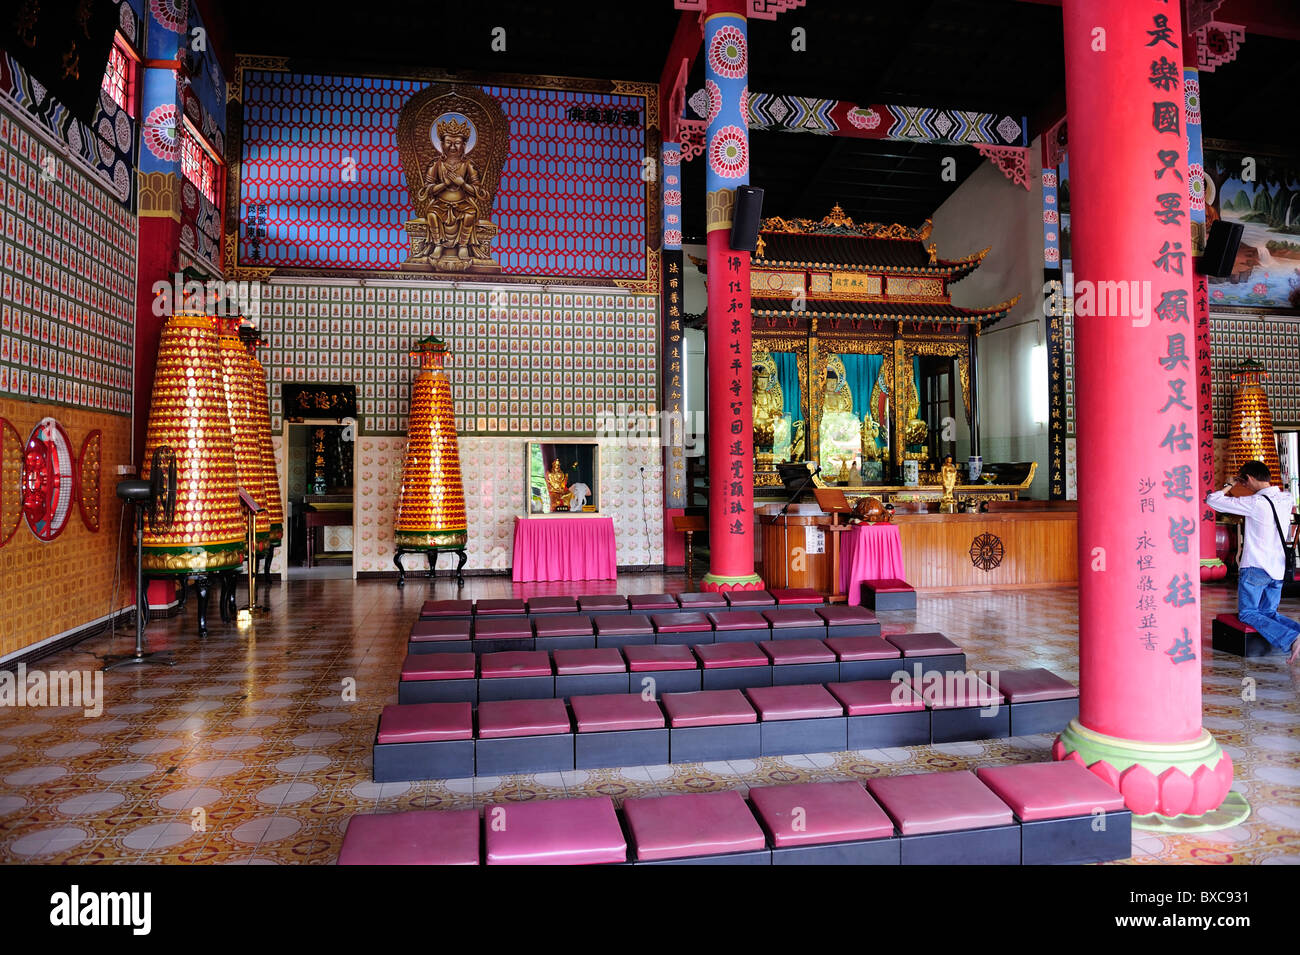 Interior of Puh Toh Si Chinese Temple near Kota Kinabalu, Sabah - Stock Image